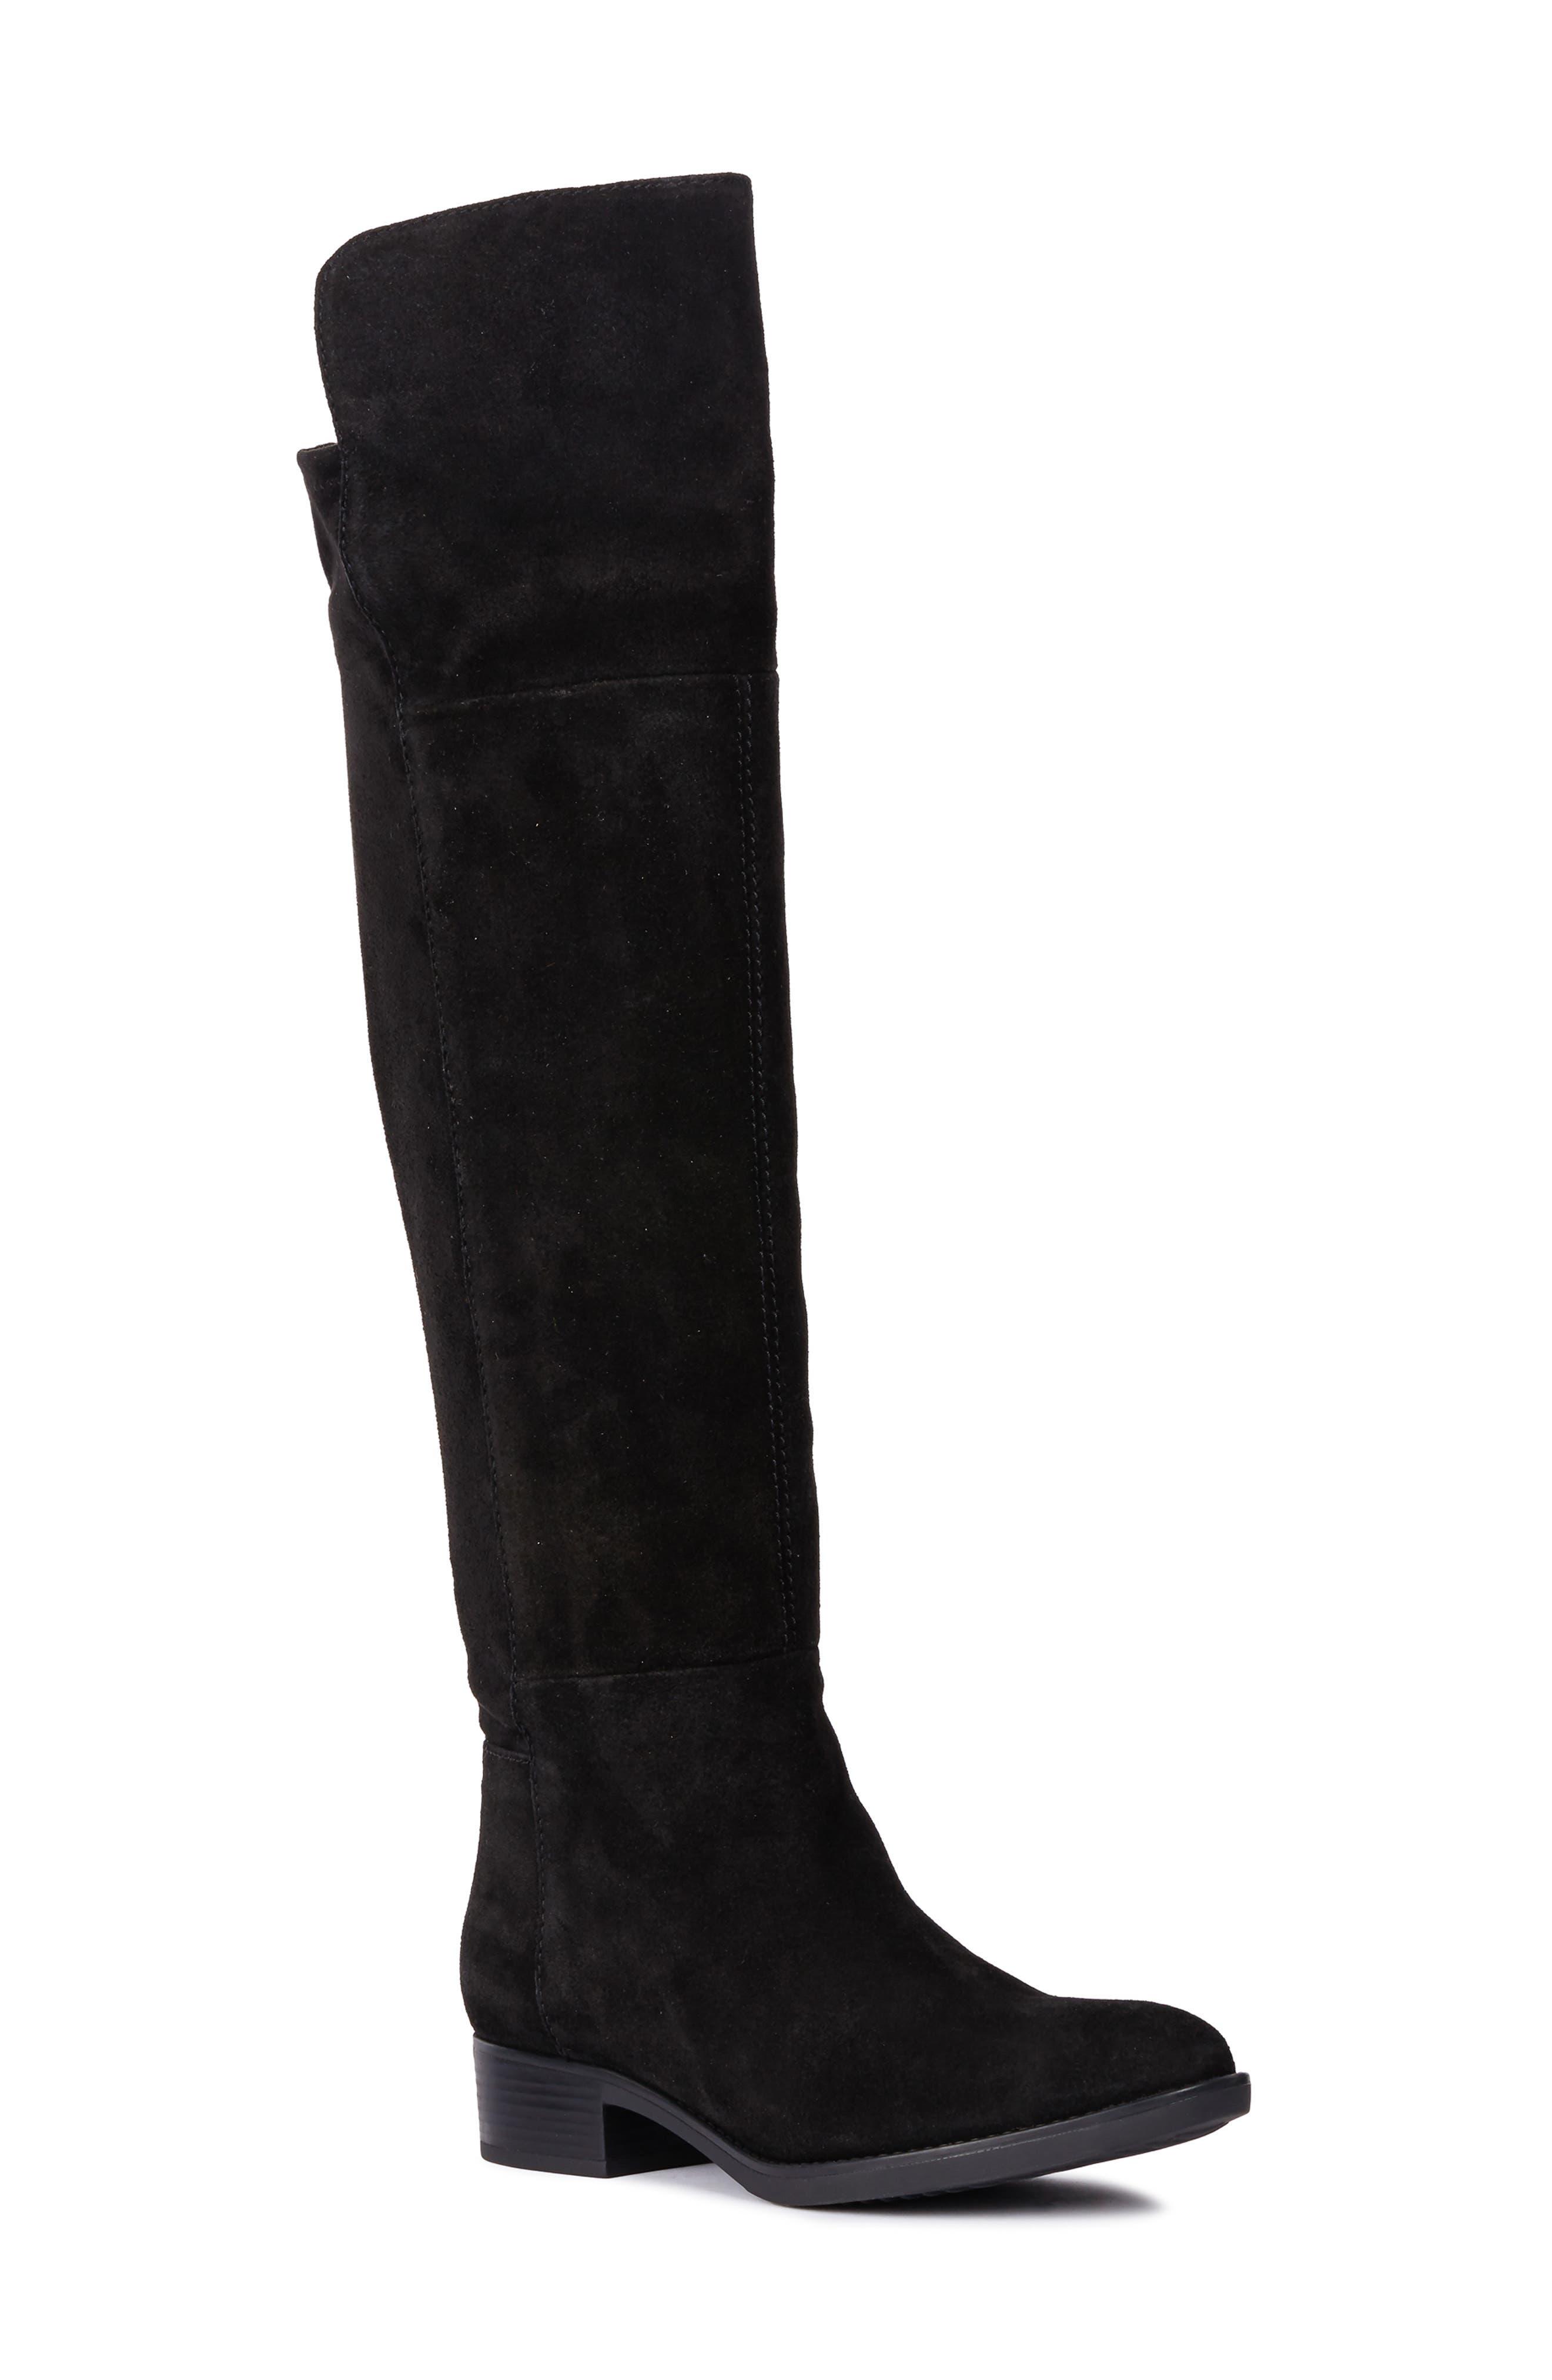 Geox Felicity Knee High Boot, Black